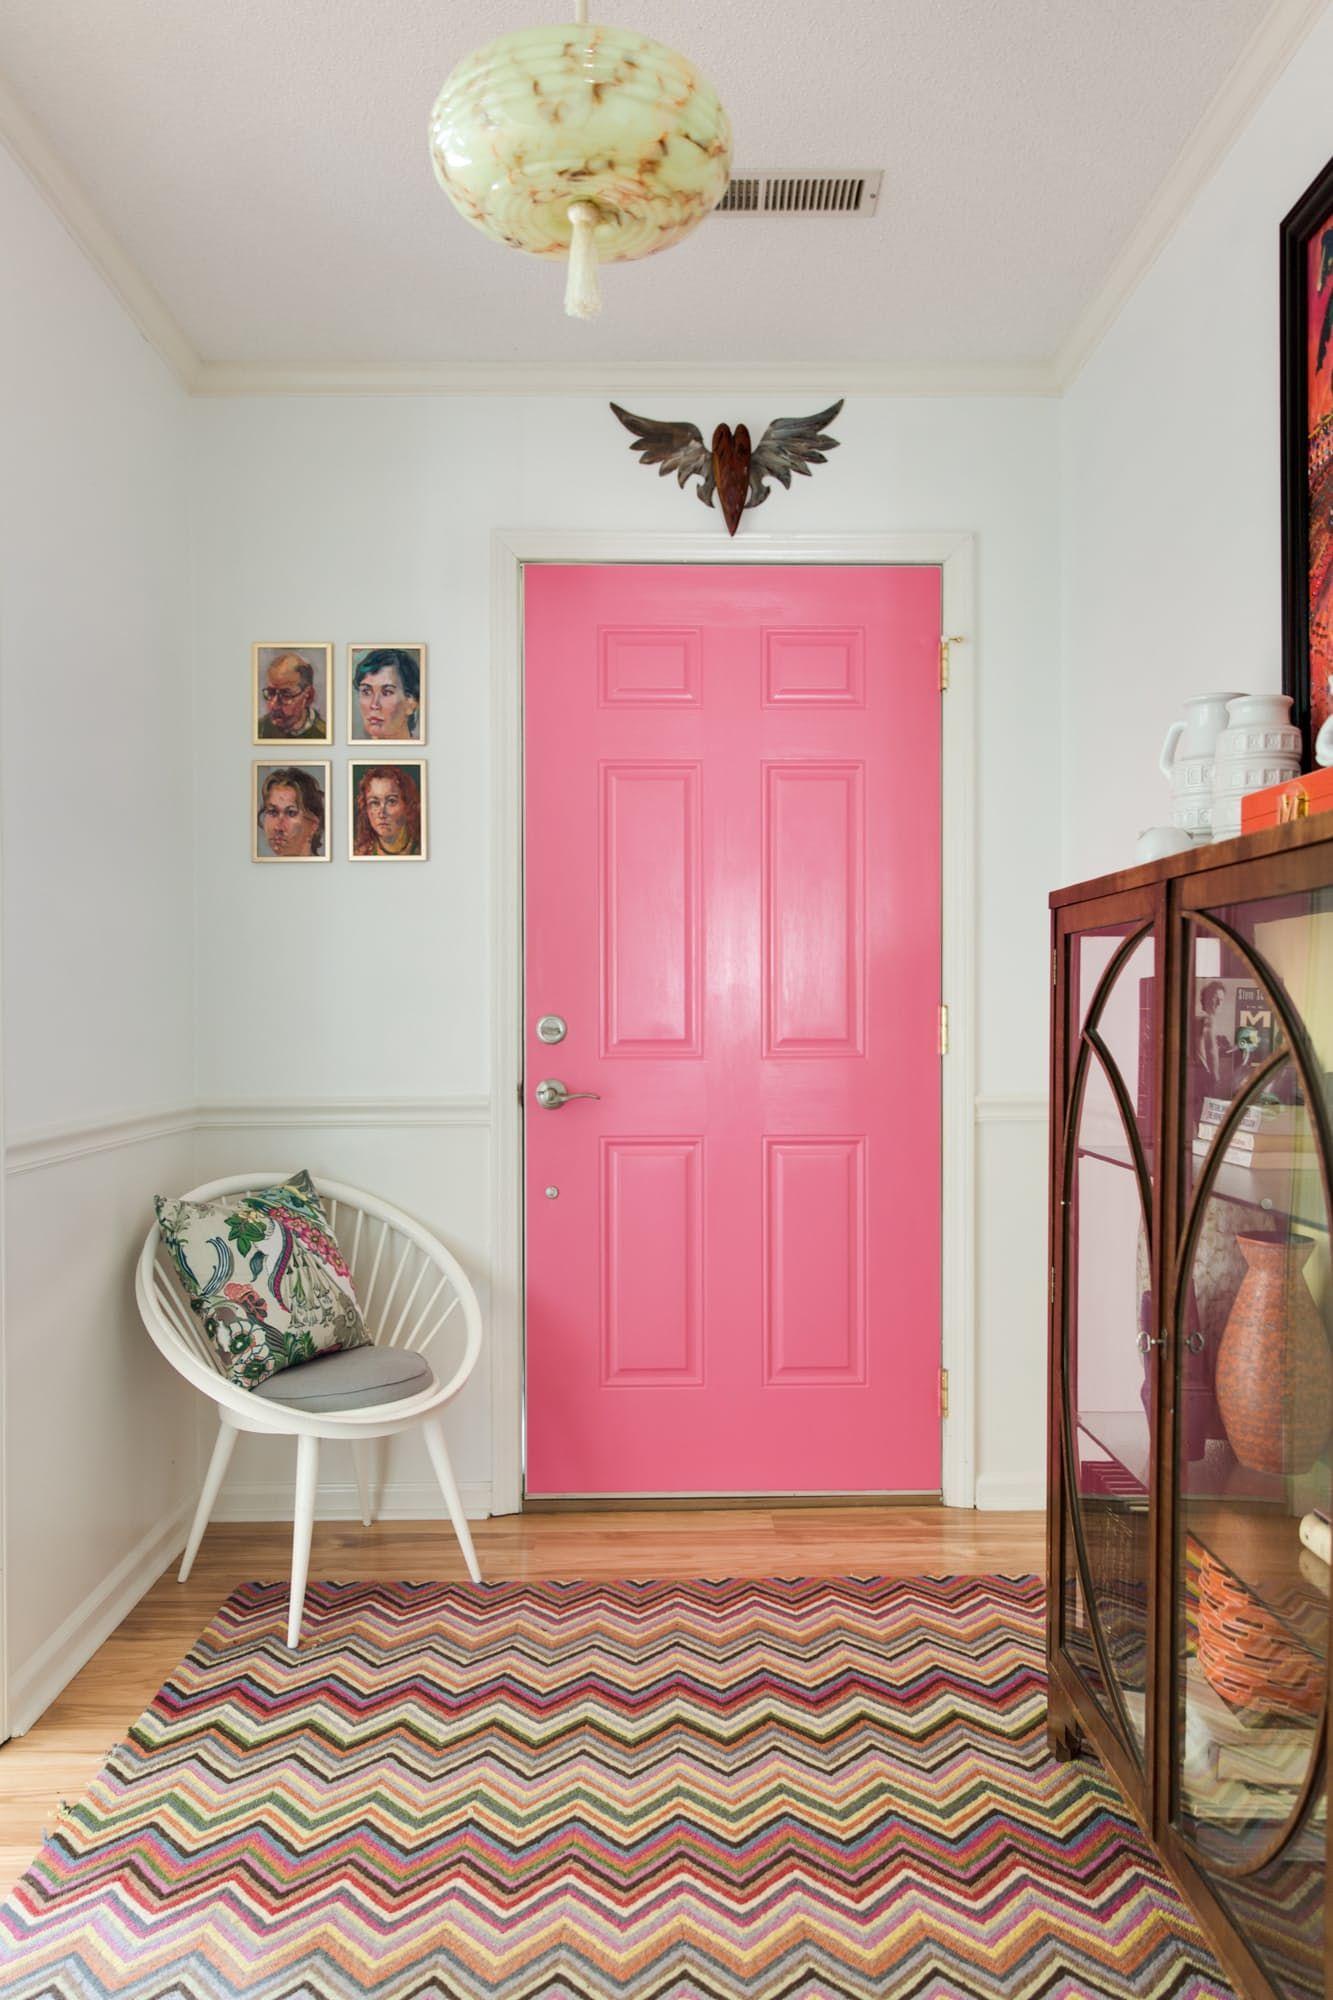 House Tour: A Colorful \